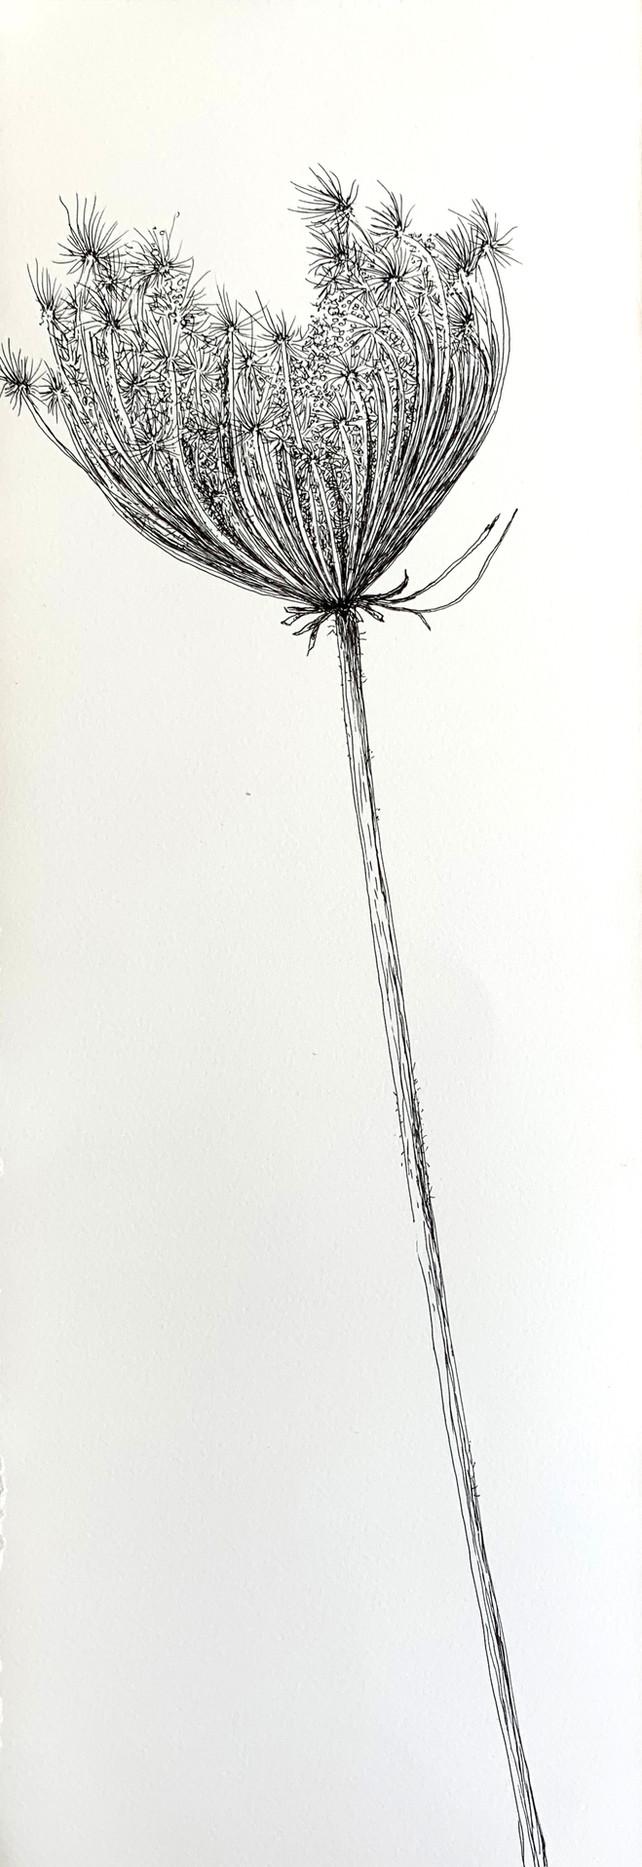 Dry Wild Carrot 4 (Pen on Arche Paper 19X53 cm)